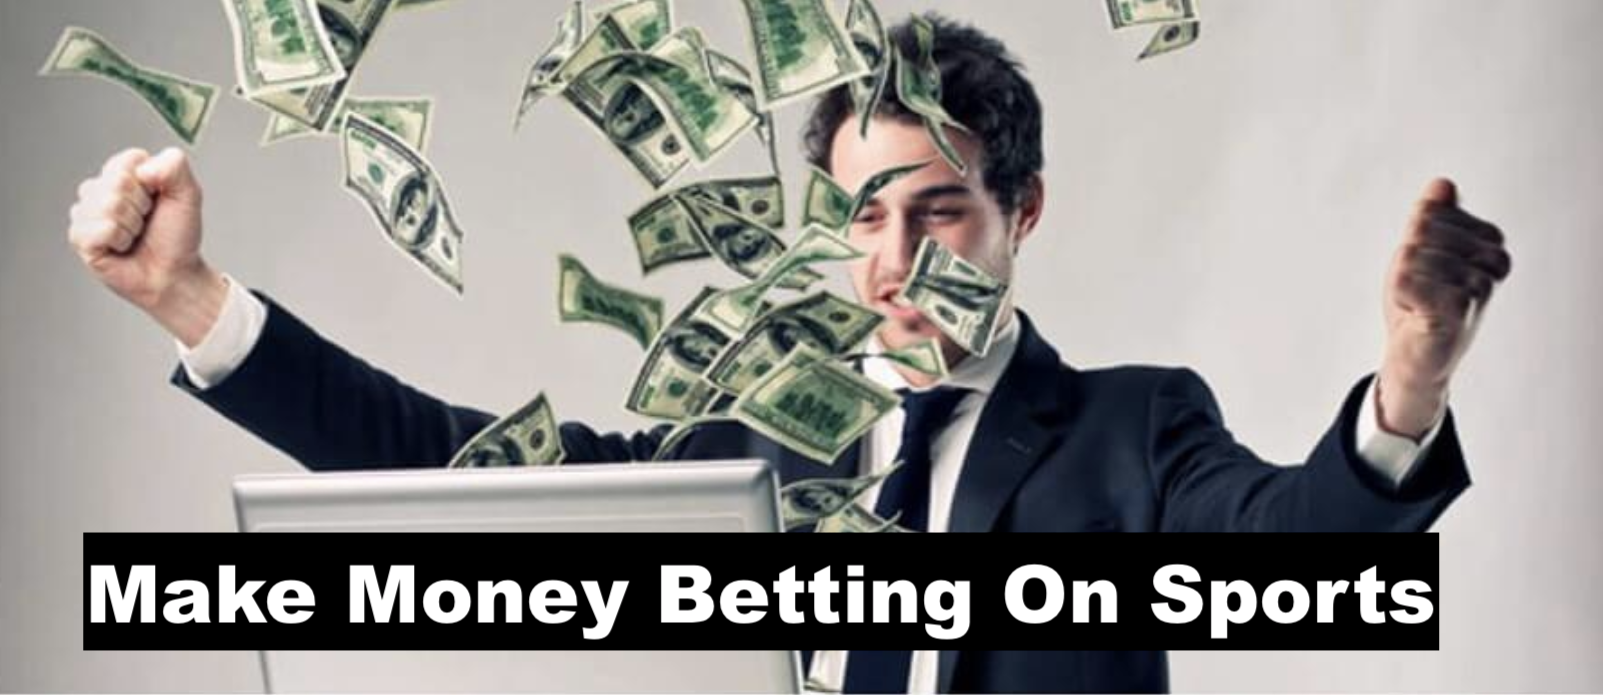 Make money betting on sports